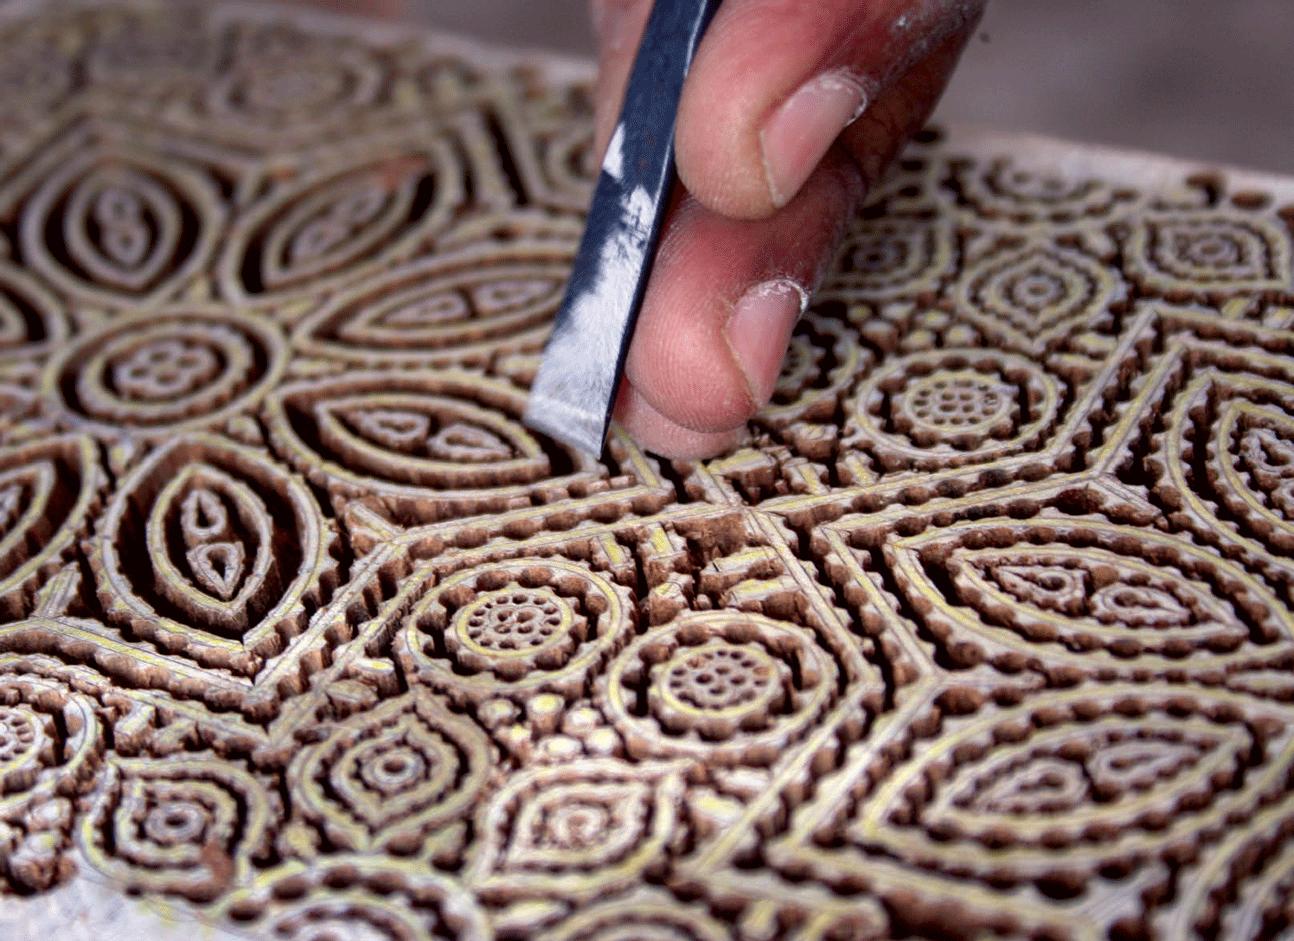 Crafting the blocks